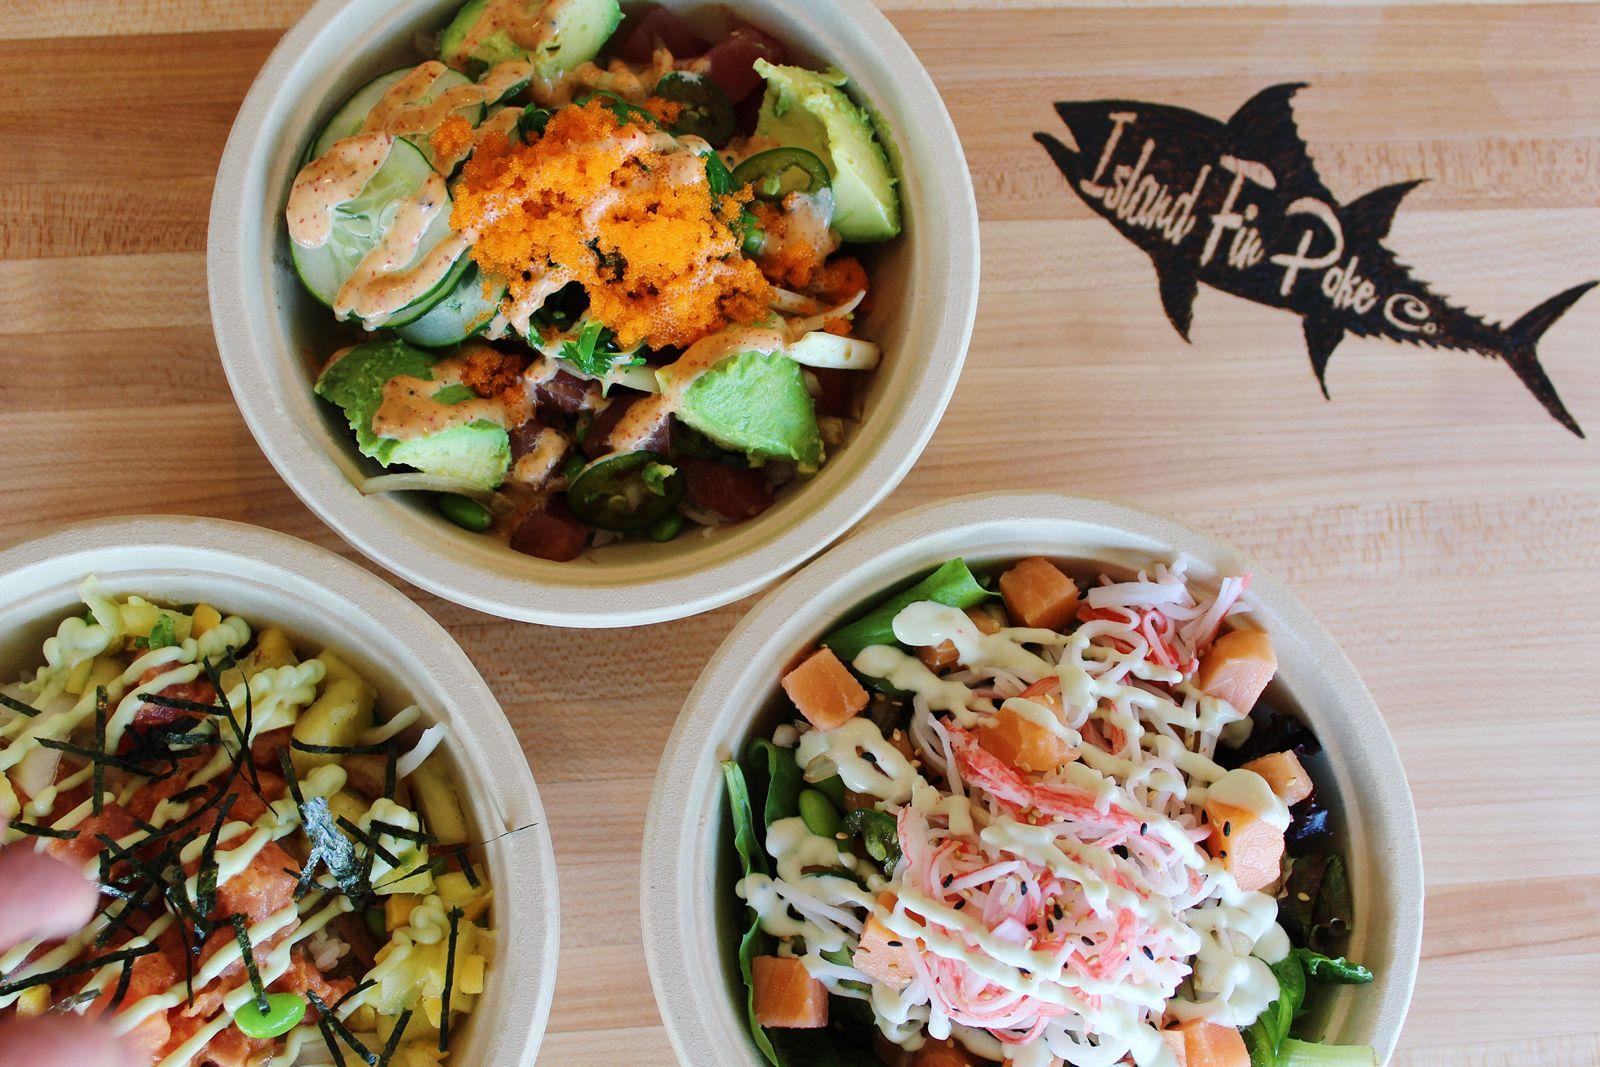 Island Fin Poké Co. Opens First NoVA Location in Falls Church